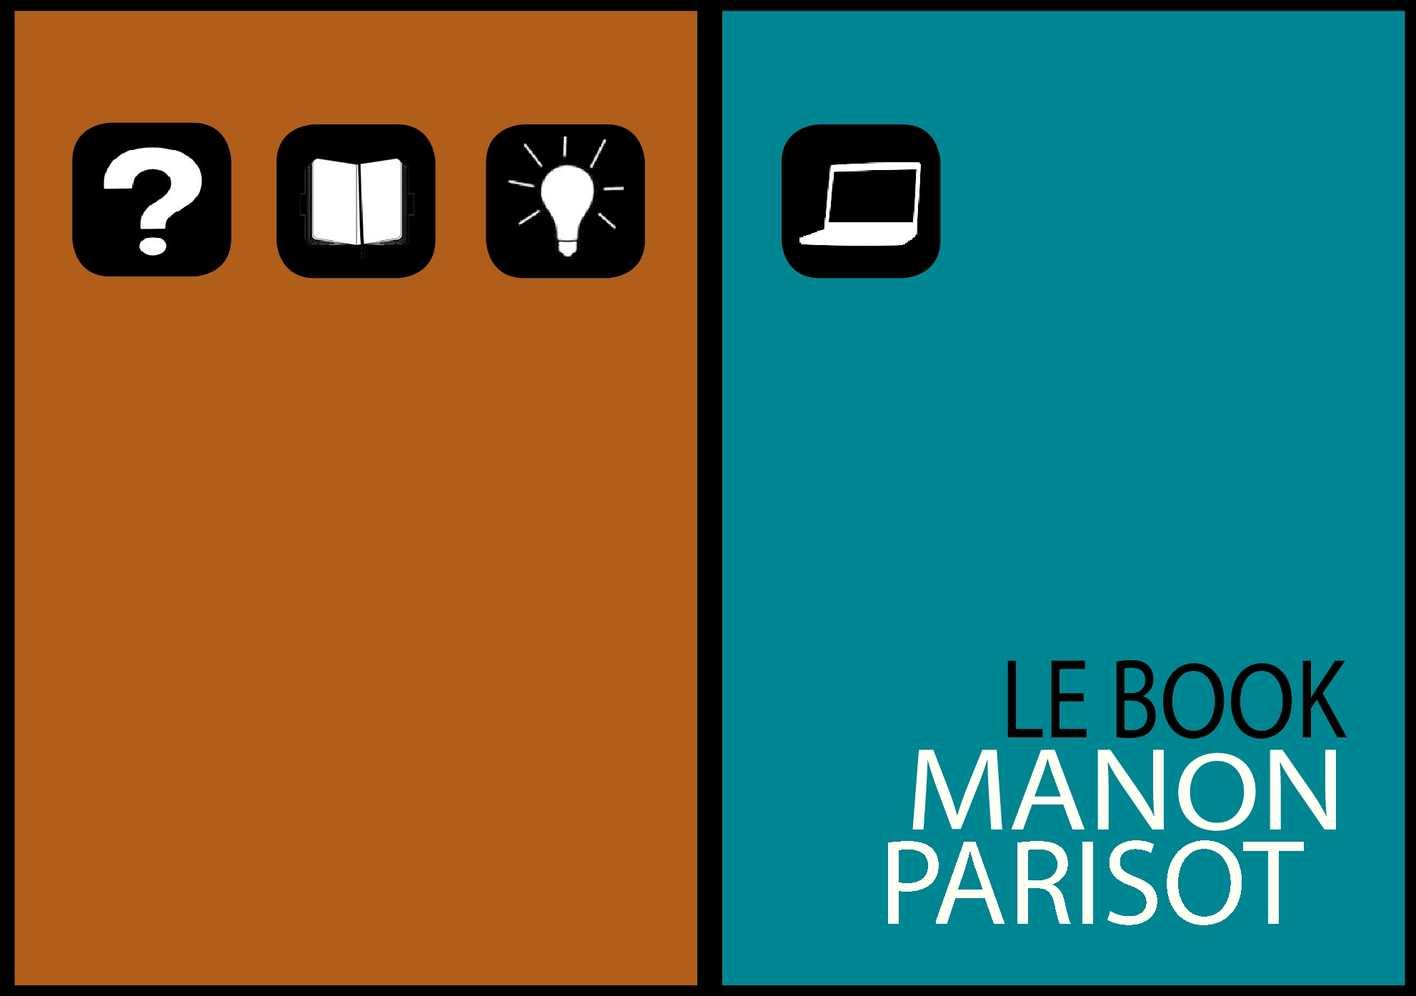 calam o book manon parisot bts communication. Black Bedroom Furniture Sets. Home Design Ideas